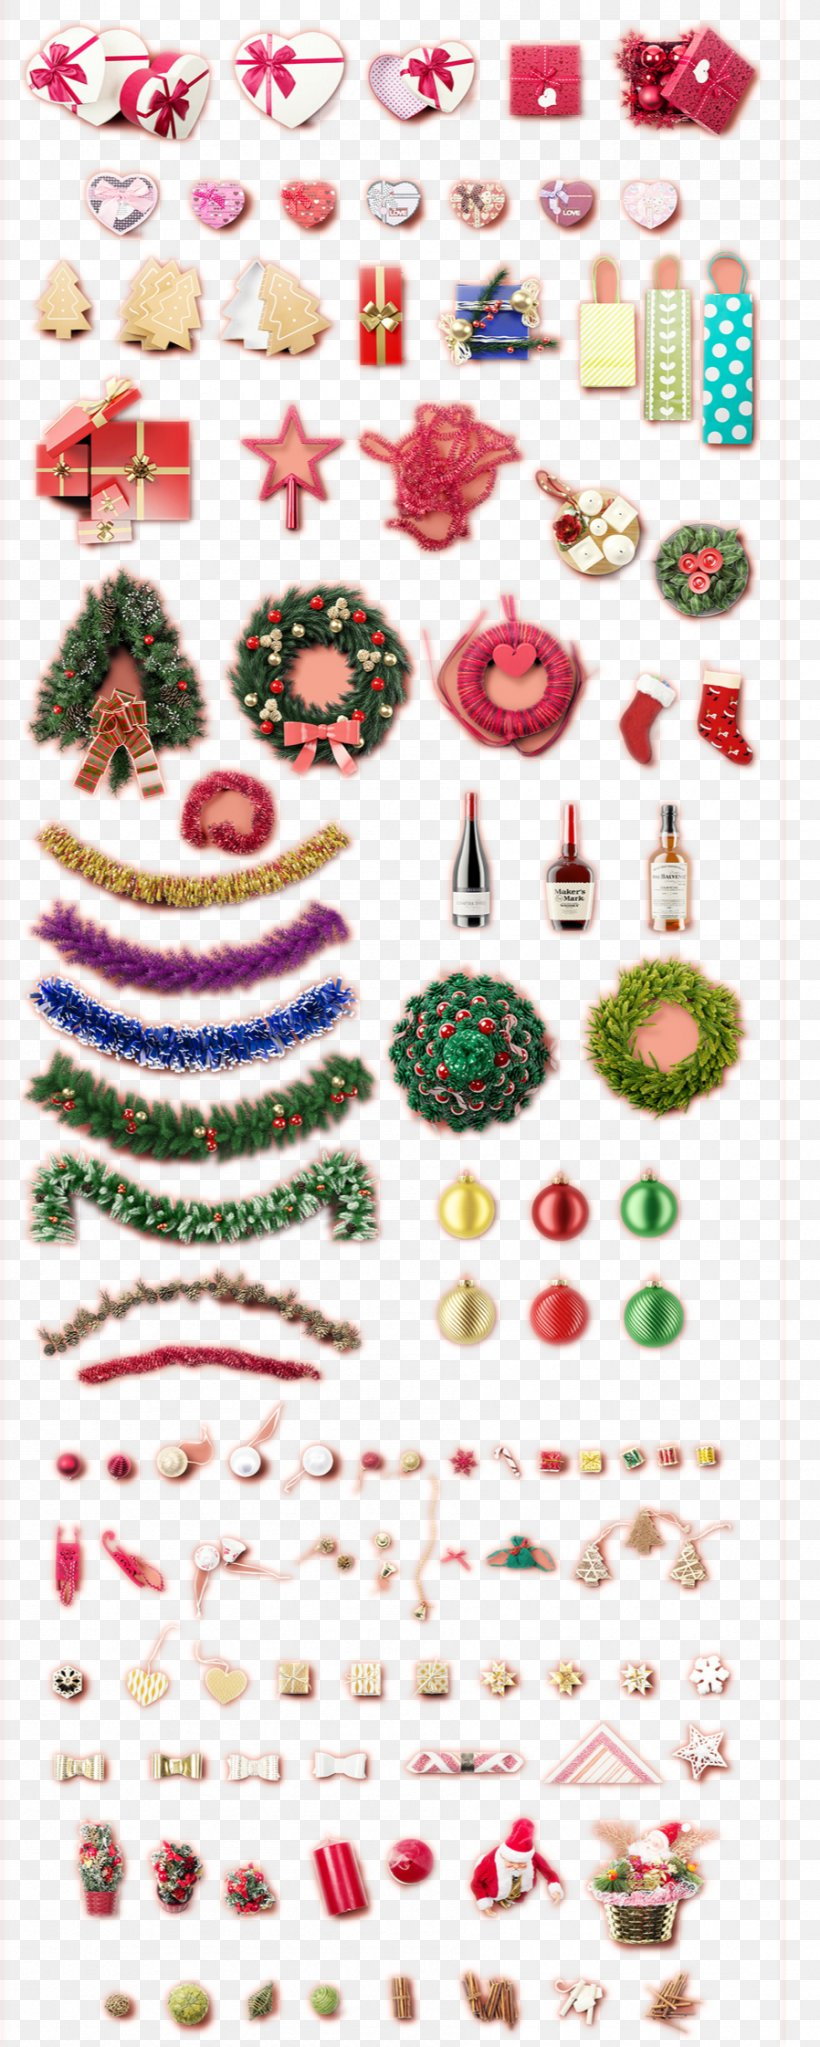 Christmas Stocking Mockup Gift, PNG, 898x2242px, Christmas, Christmas Decoration, Christmas Ornament, Christmas Stockings, Christmas Tree Download Free